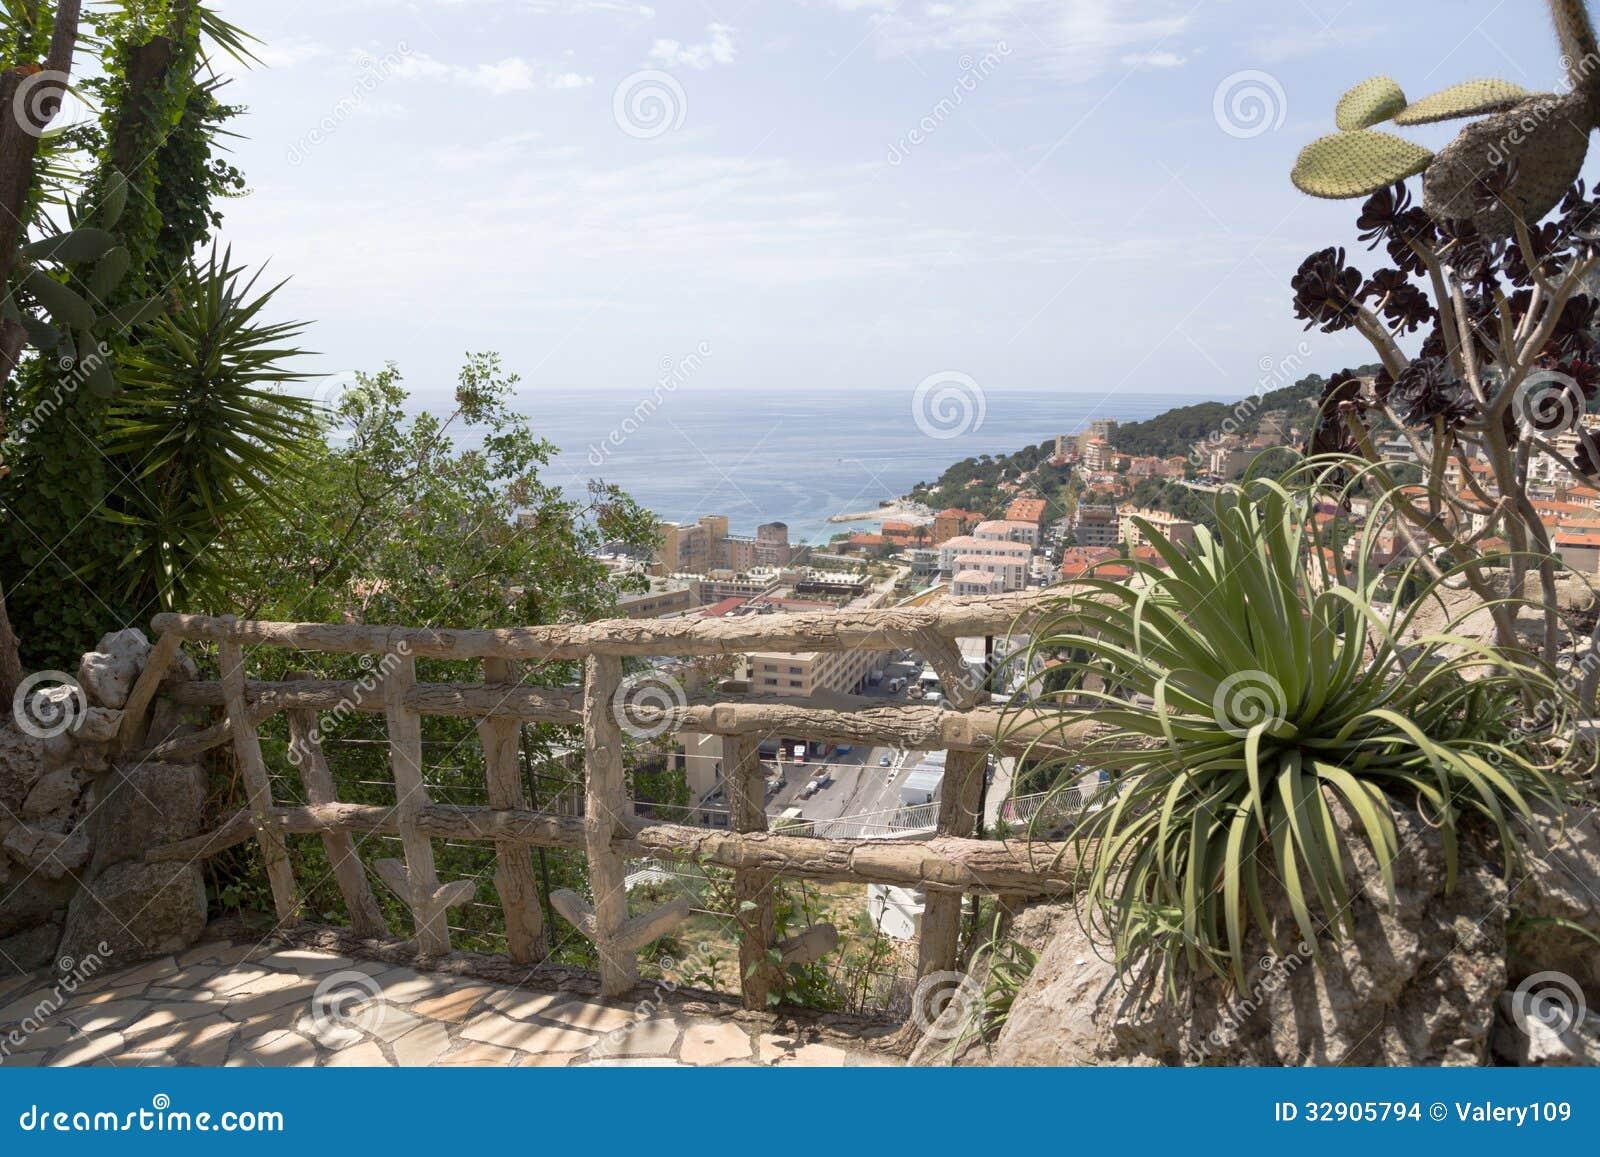 The exotic garden of monaco stock images image 32905794 - Photo de jardin exotique ...